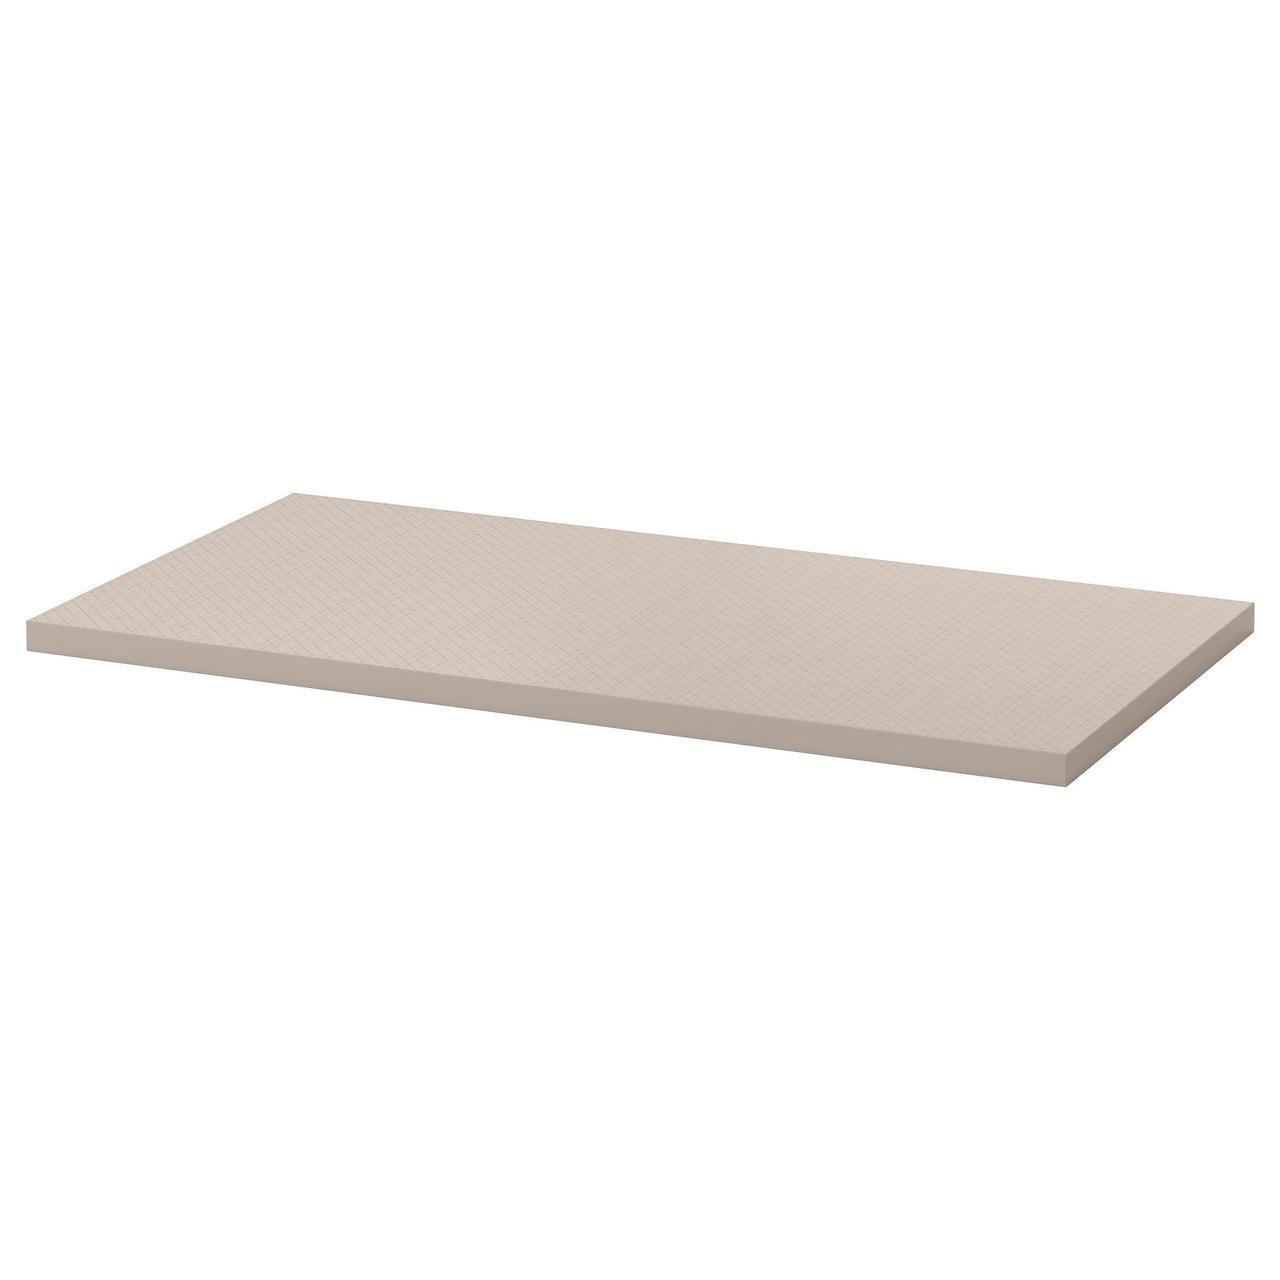 Столешница IKEA LINNMON геометрический бежевый 120x60 см 603.537.58